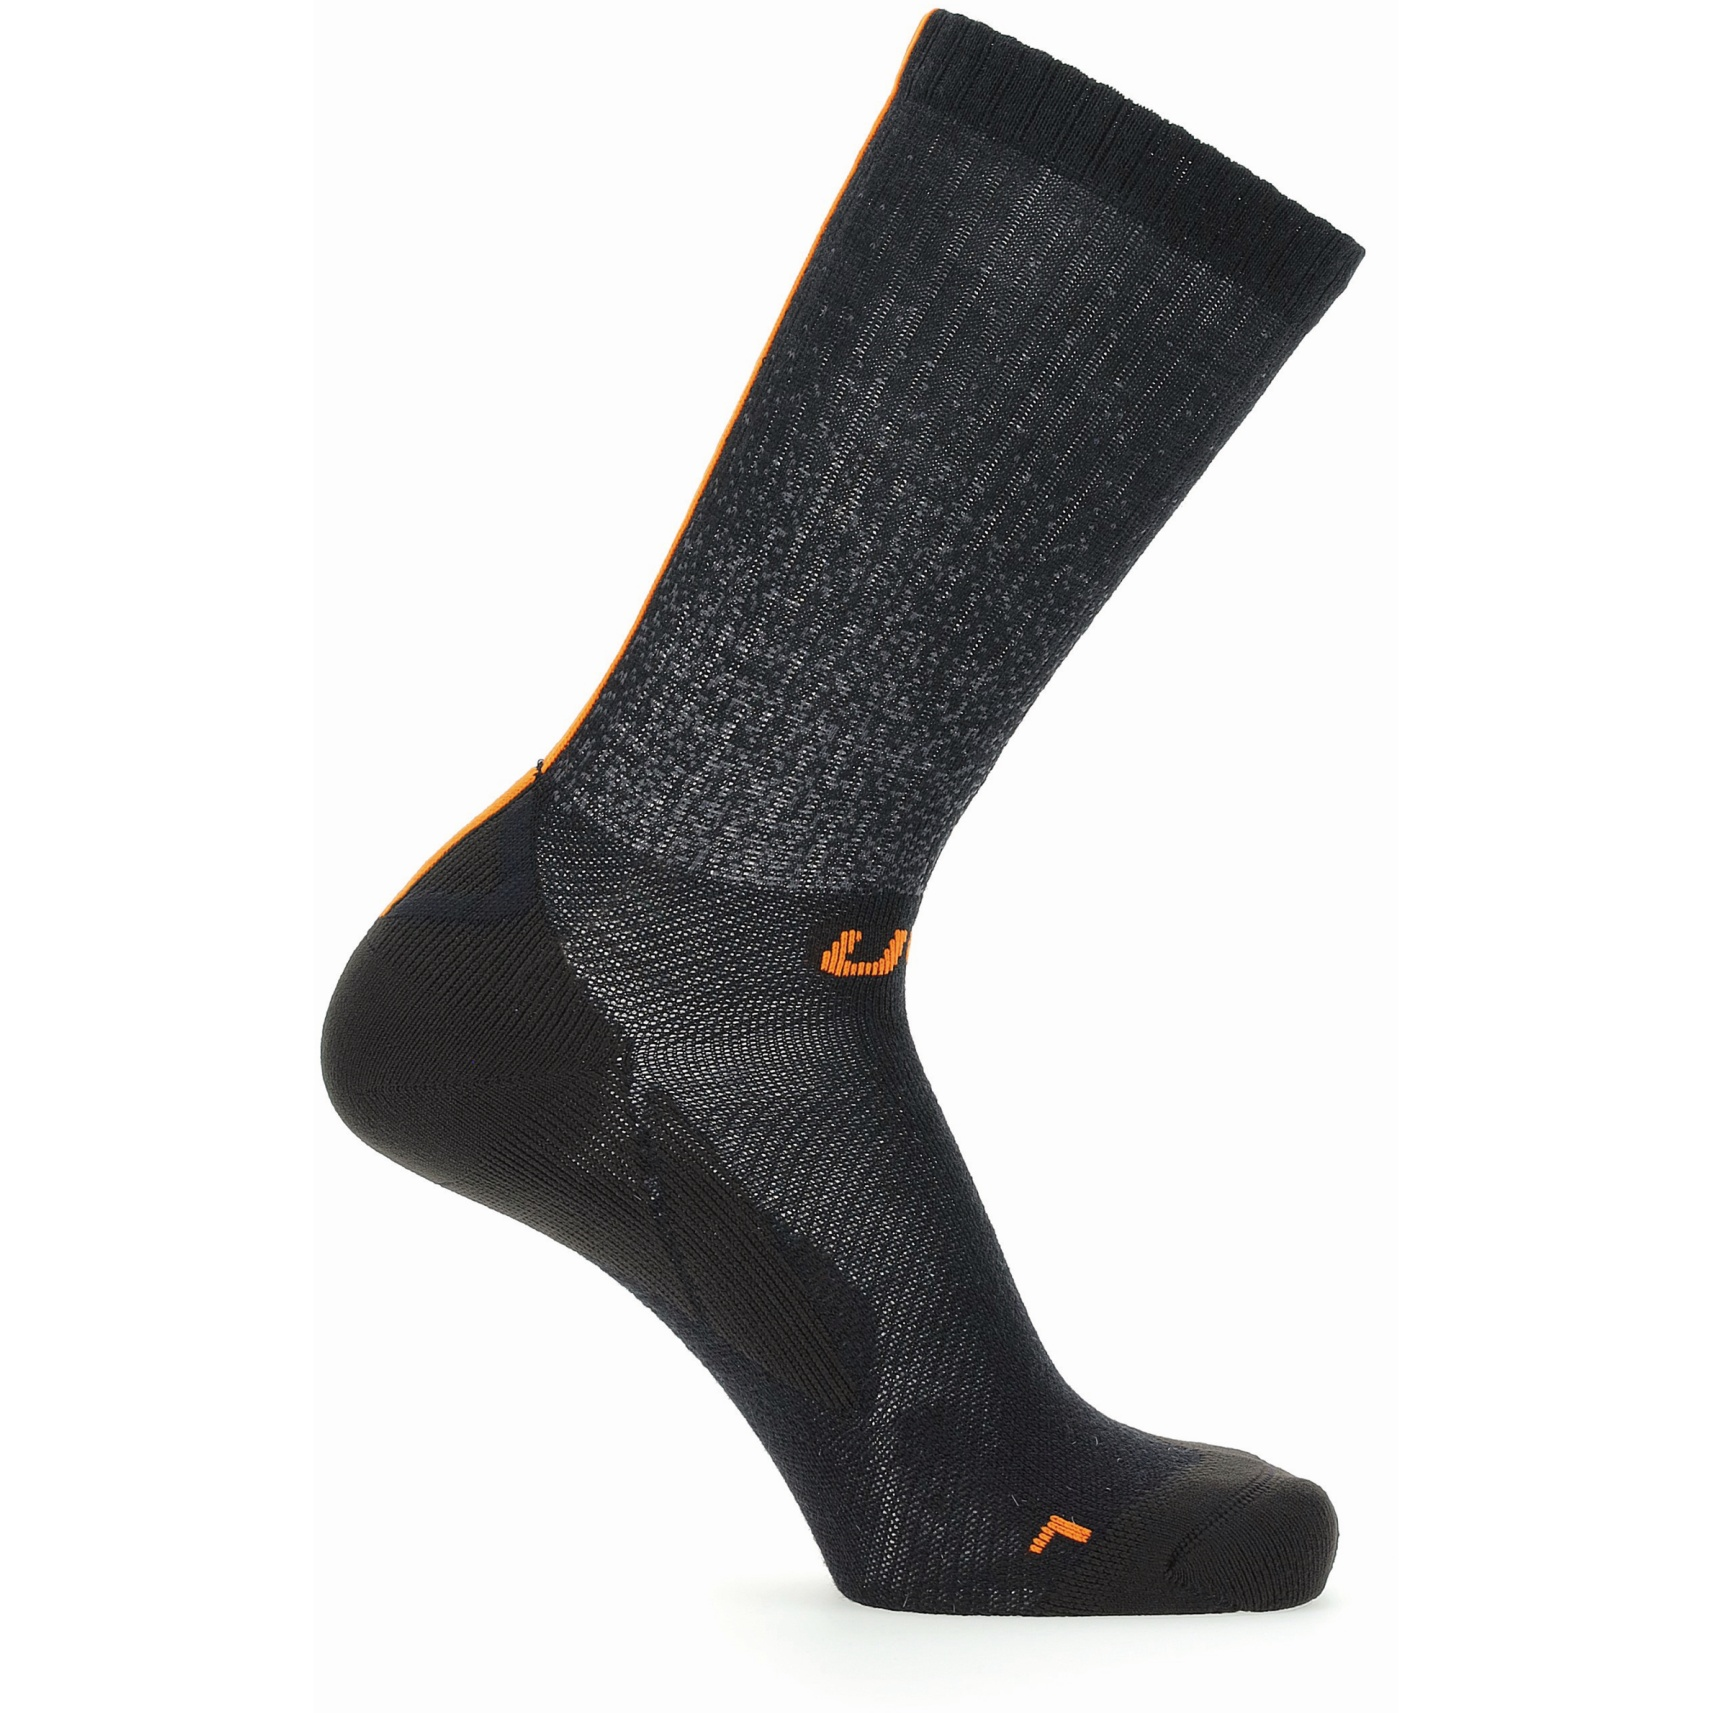 Image of UYN Cycling Aero Winter Socks - Black/Orange